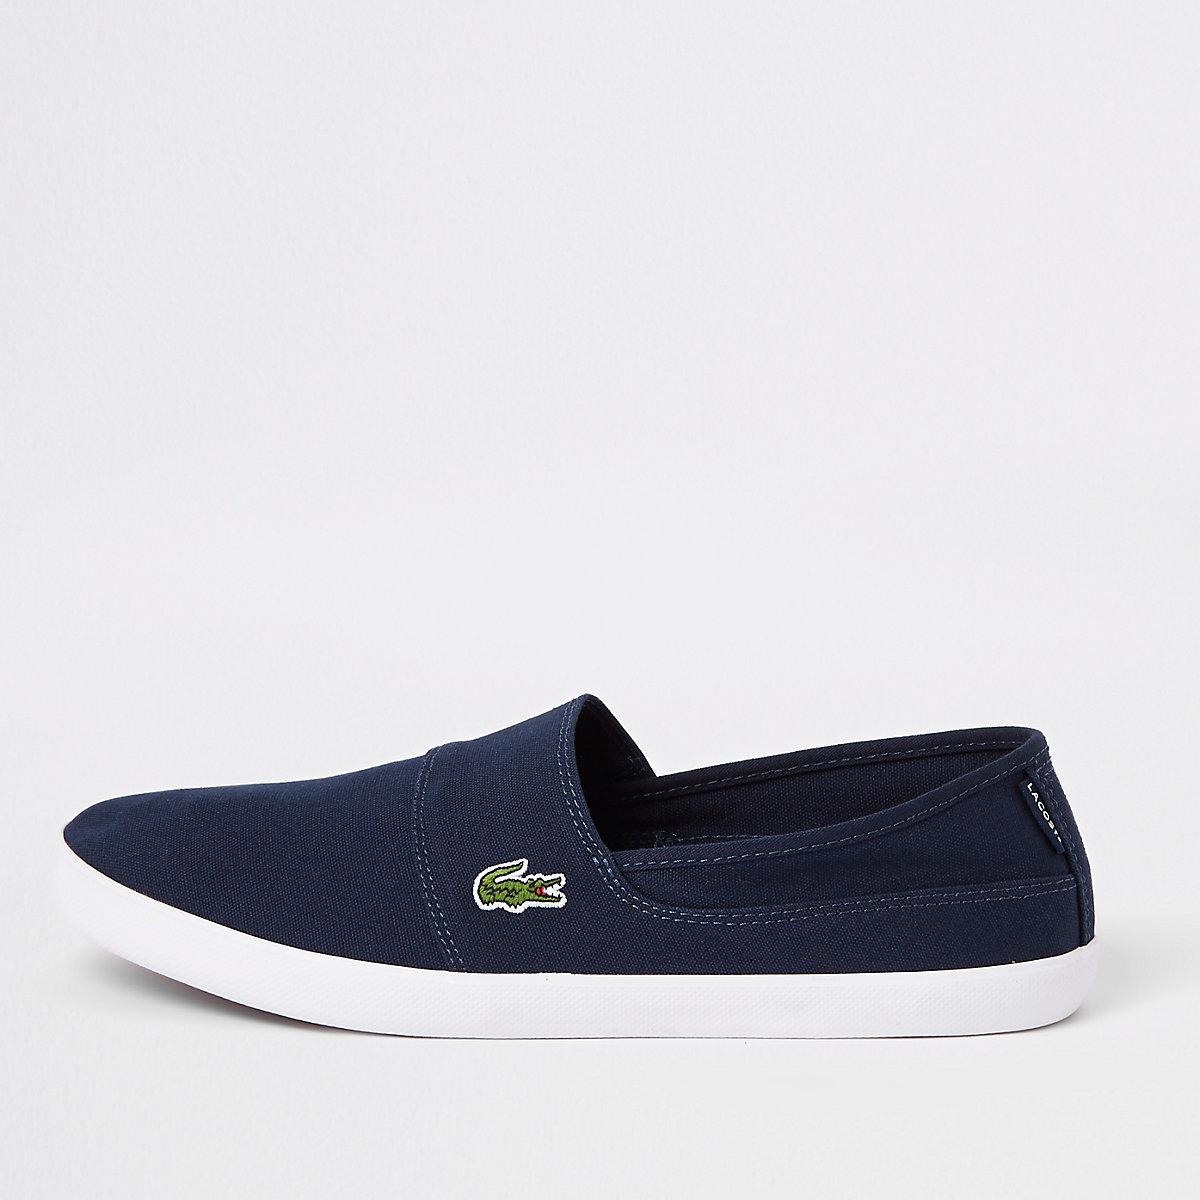 Lacoste navy slip on sneakers